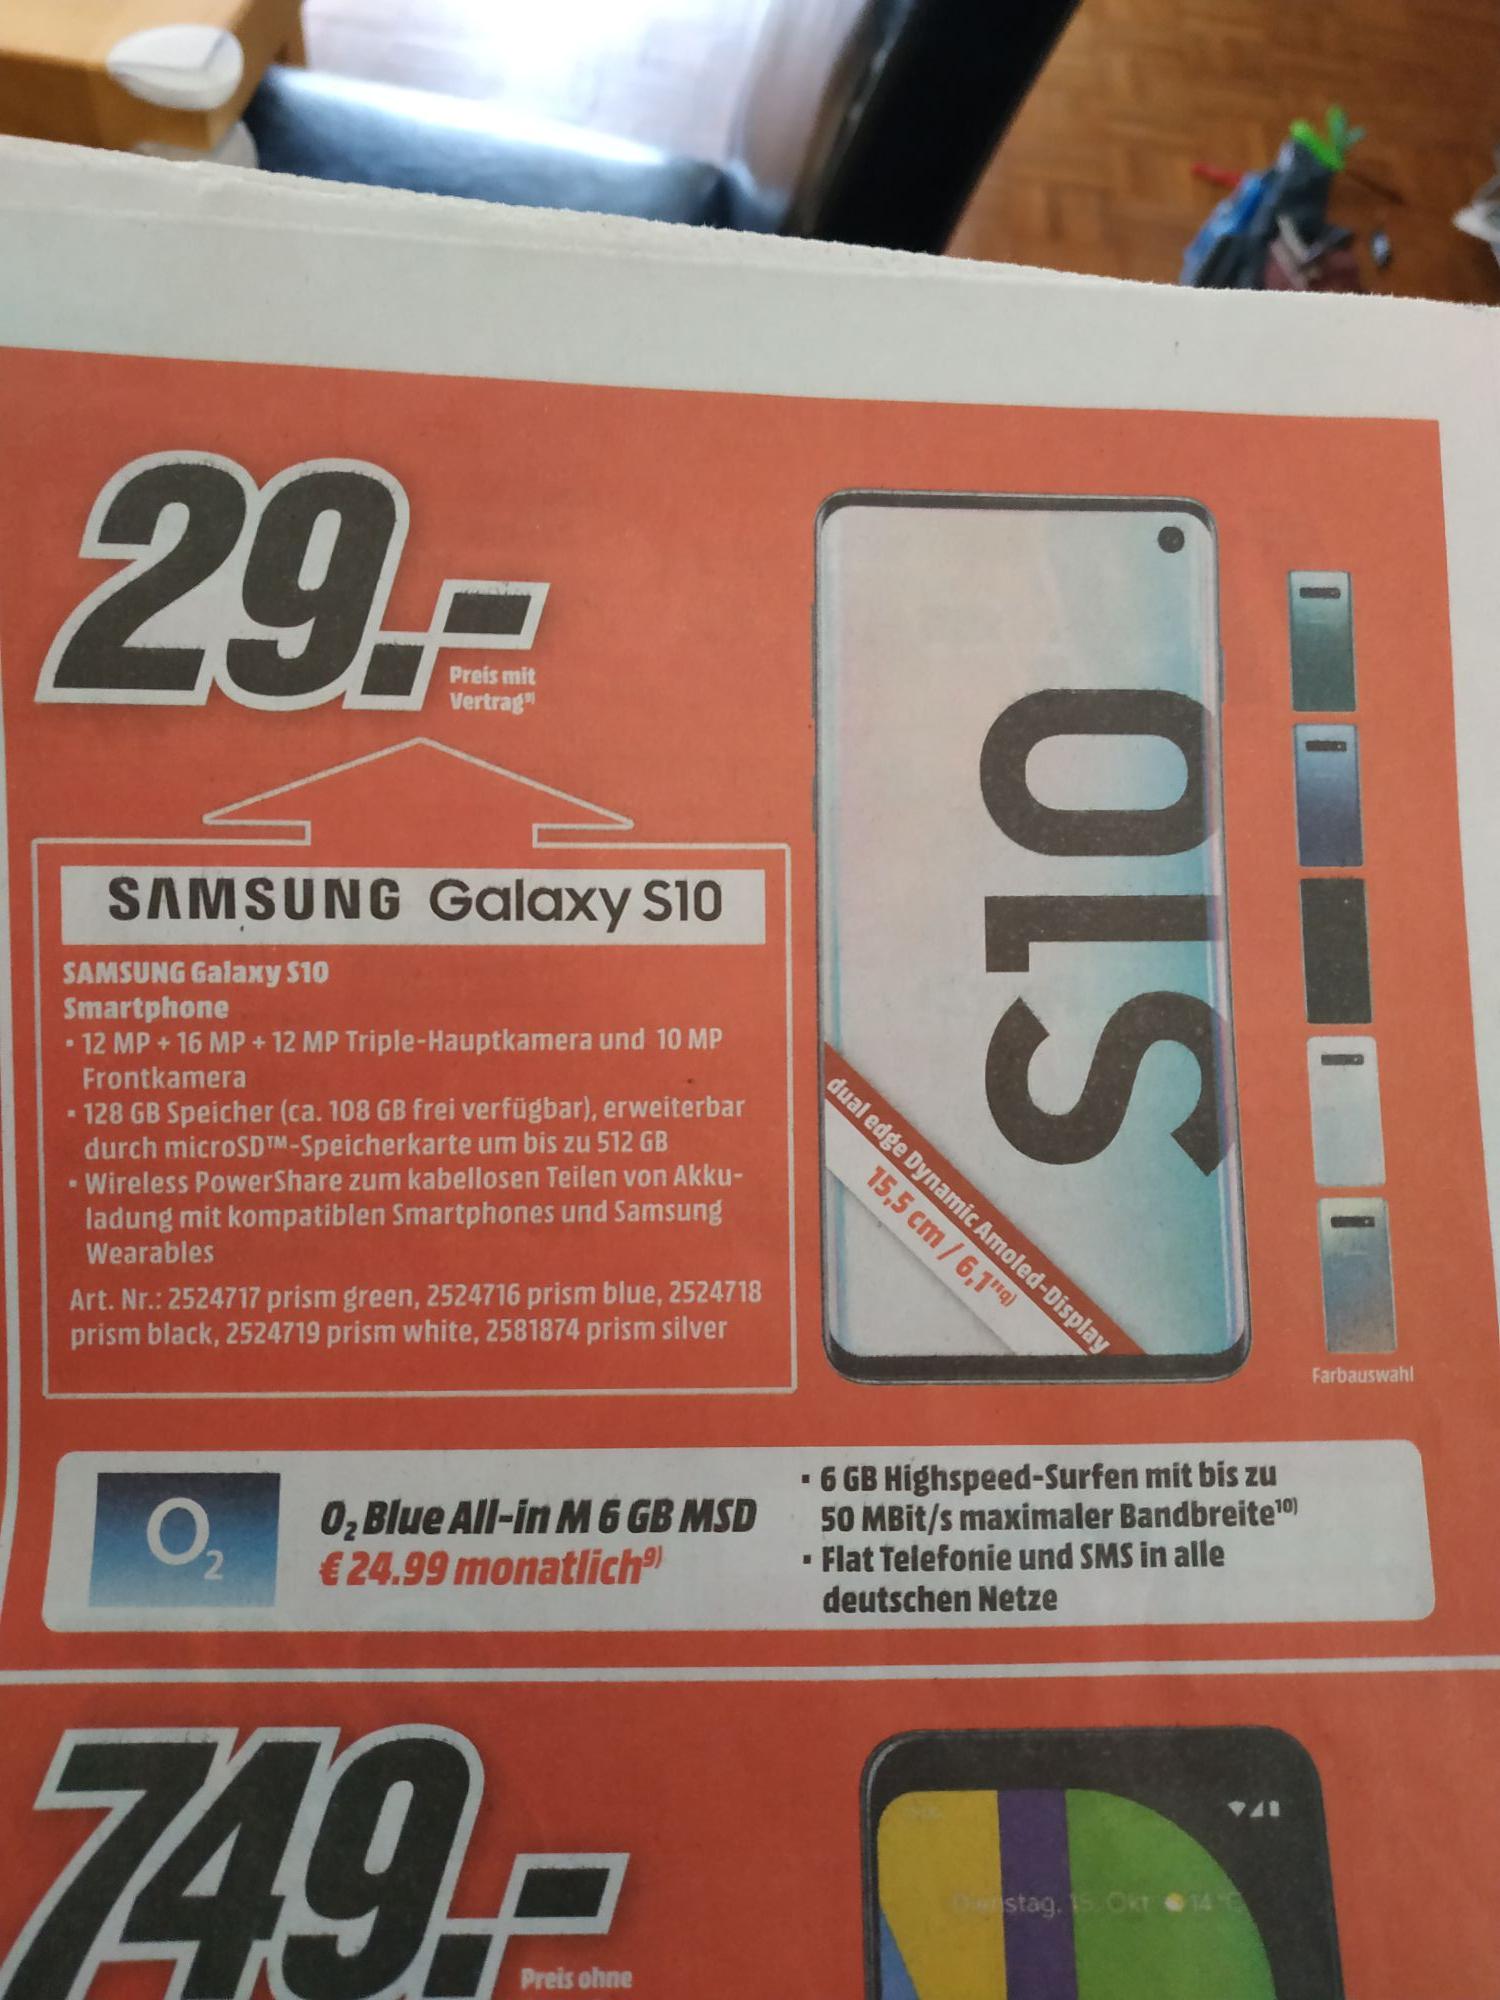 MediaMarkt/Saturn Samsung Galaxy S10 inkl O2 Blue All-in 6GB MSD